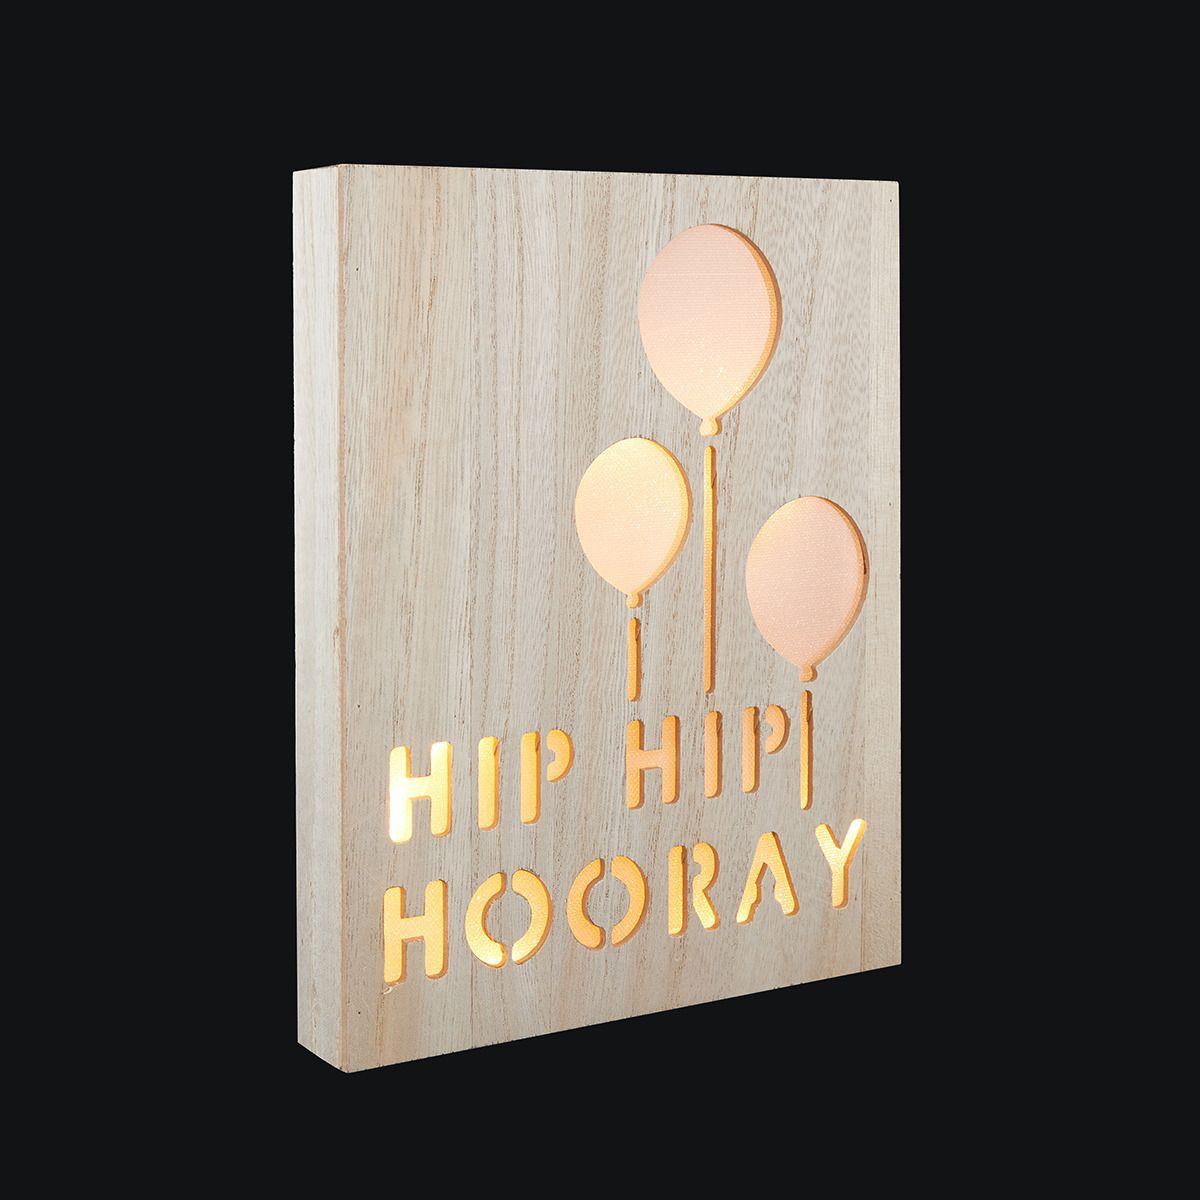 Hip Hip Hooray Light Box Kmart Sunshine first birthday